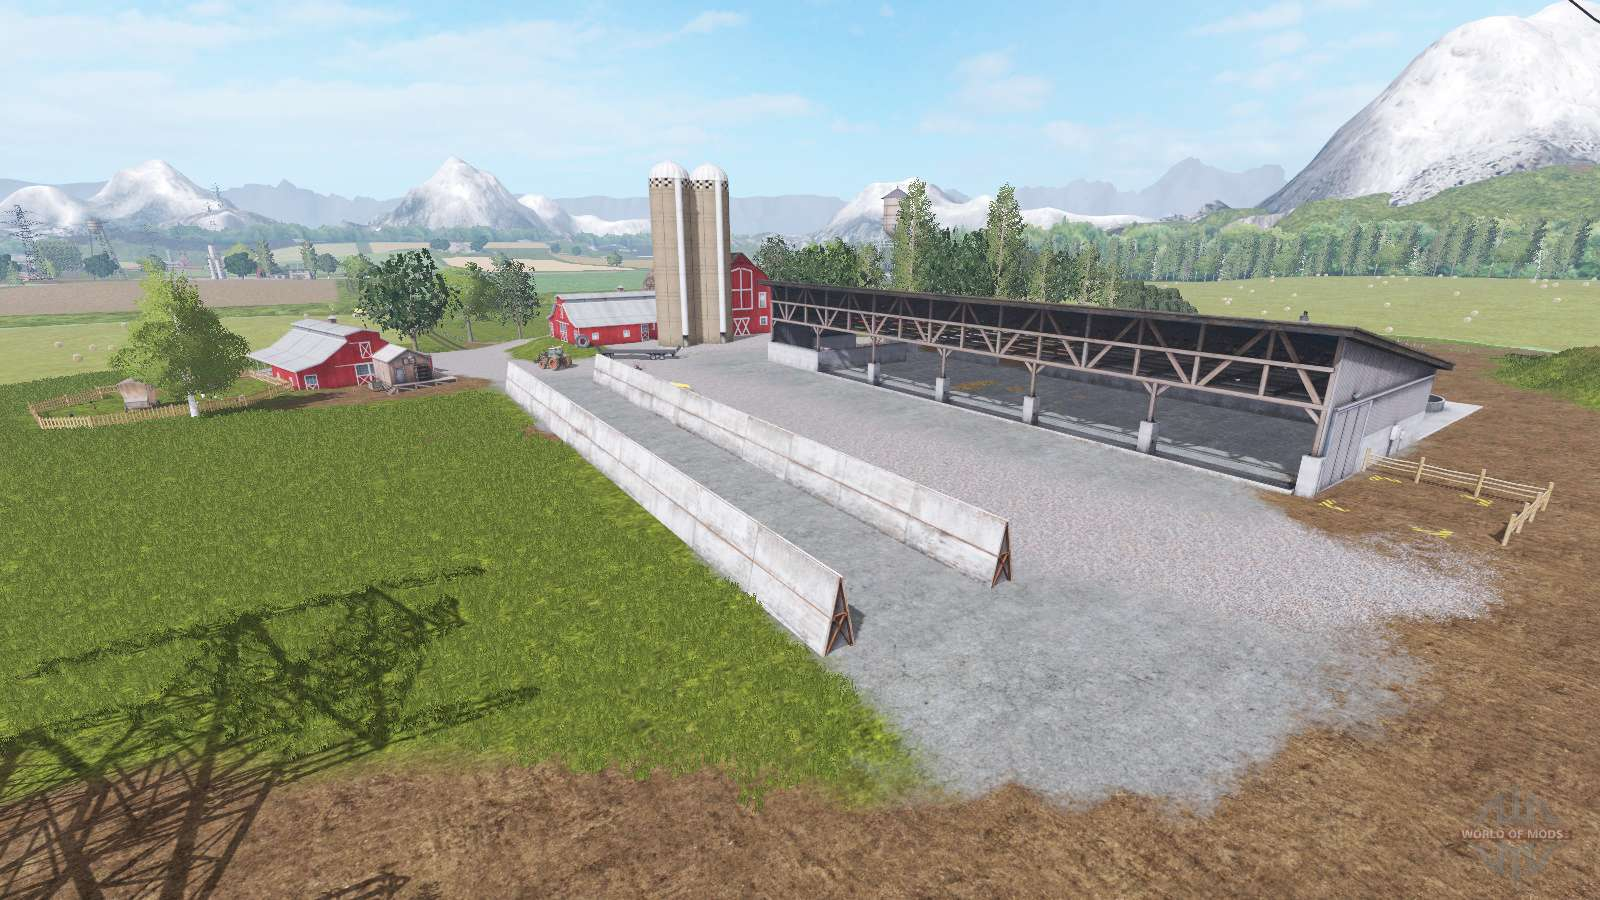 Goldcrest Valley edited for Farming Simulator 2017